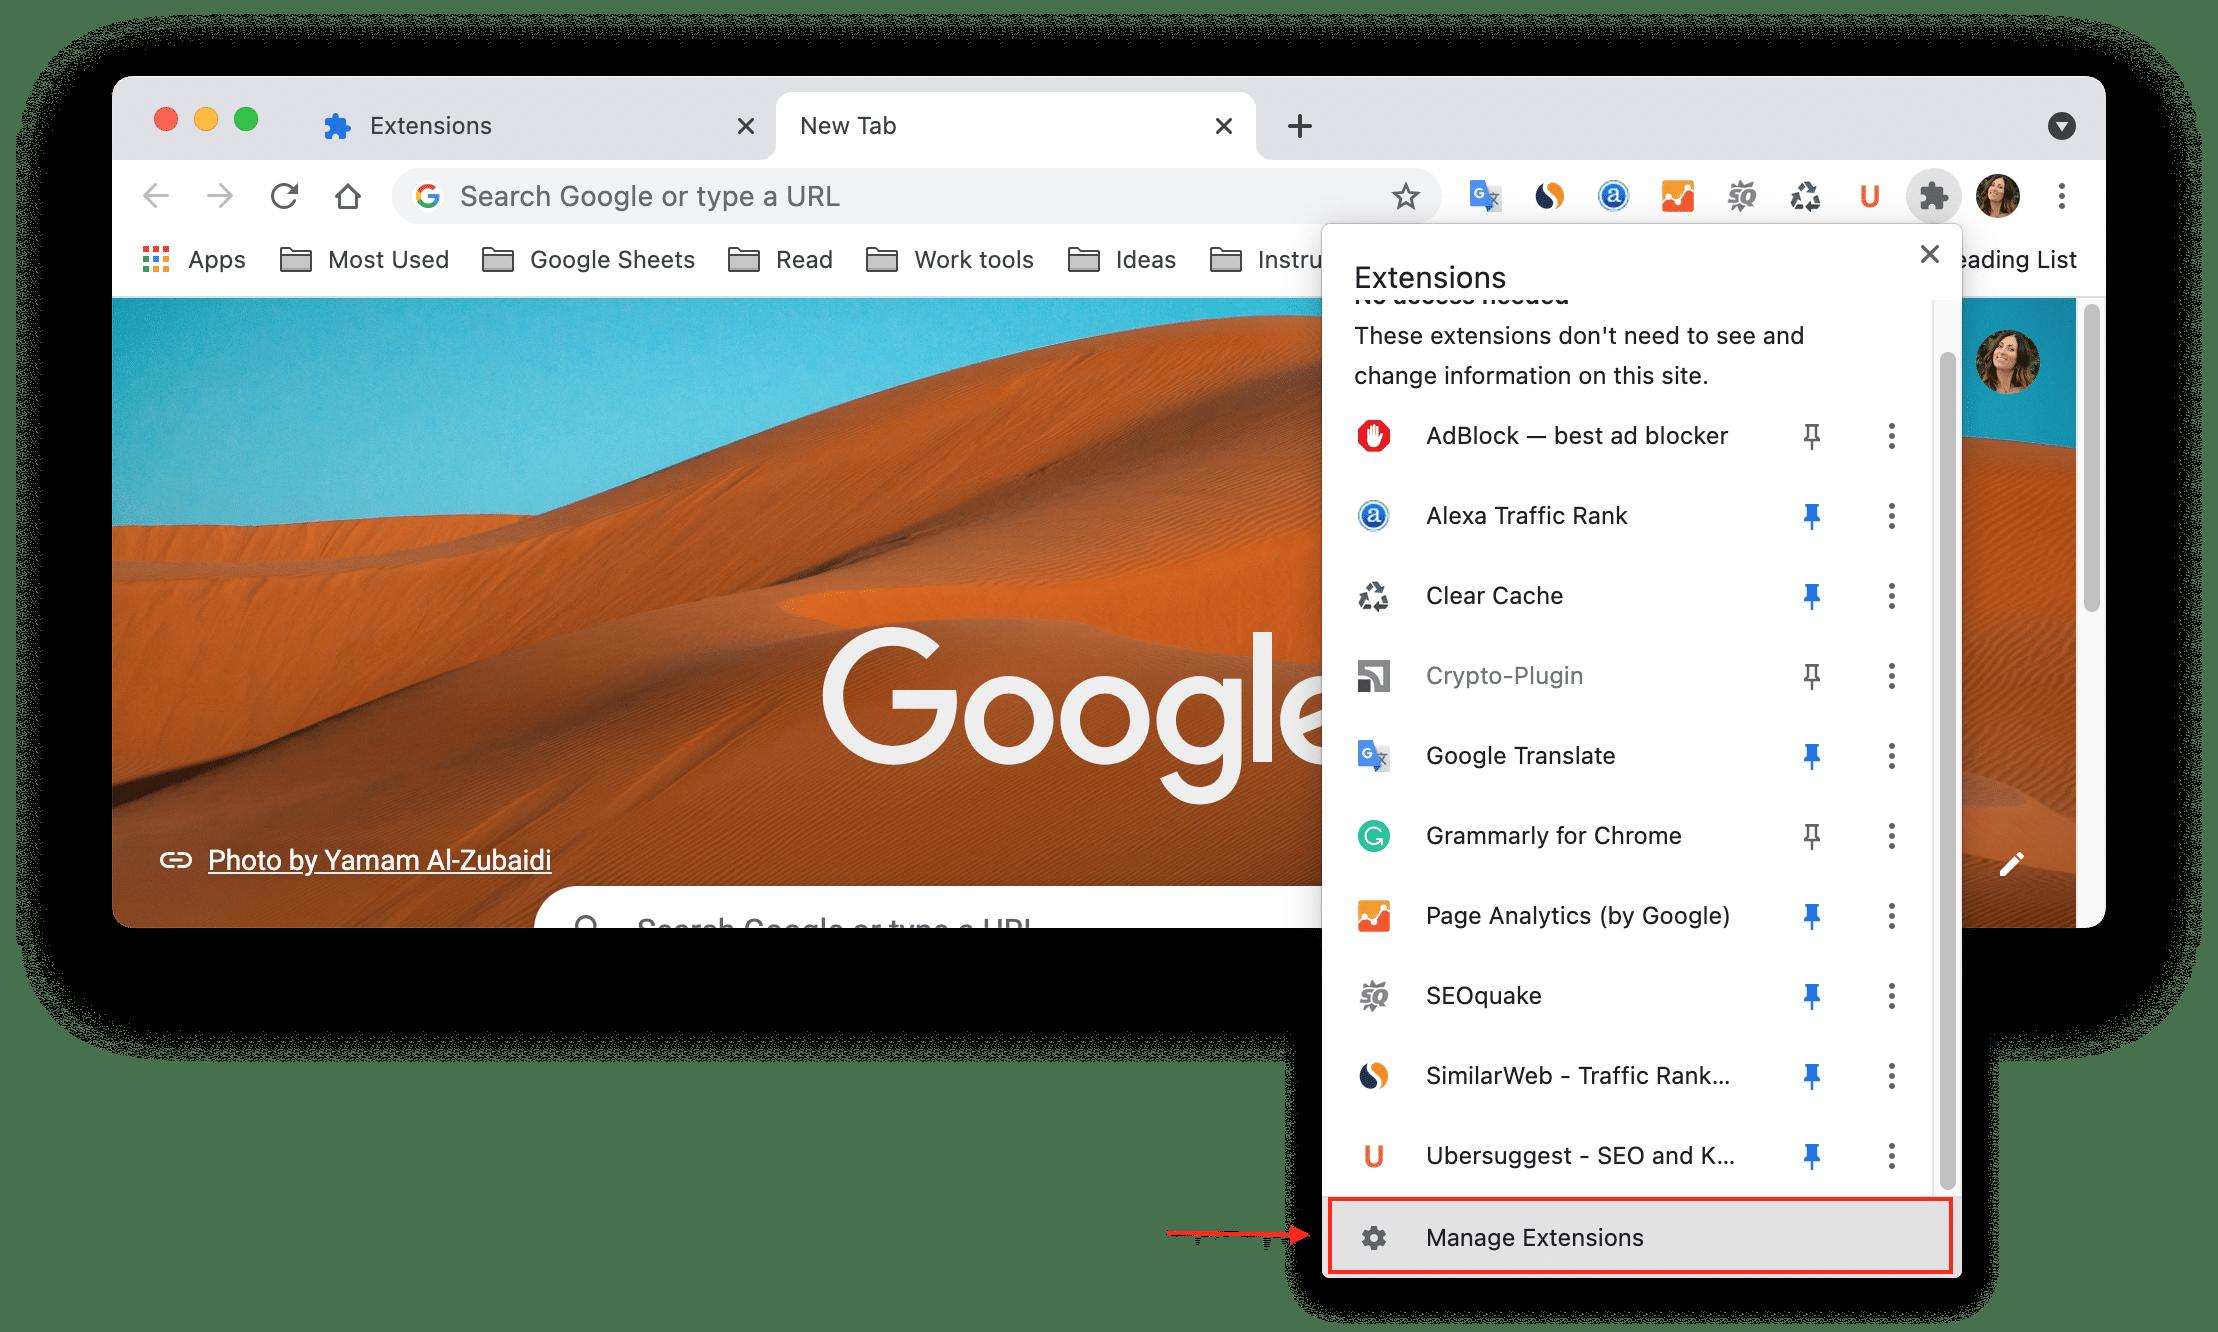 Chrome Extensions menu